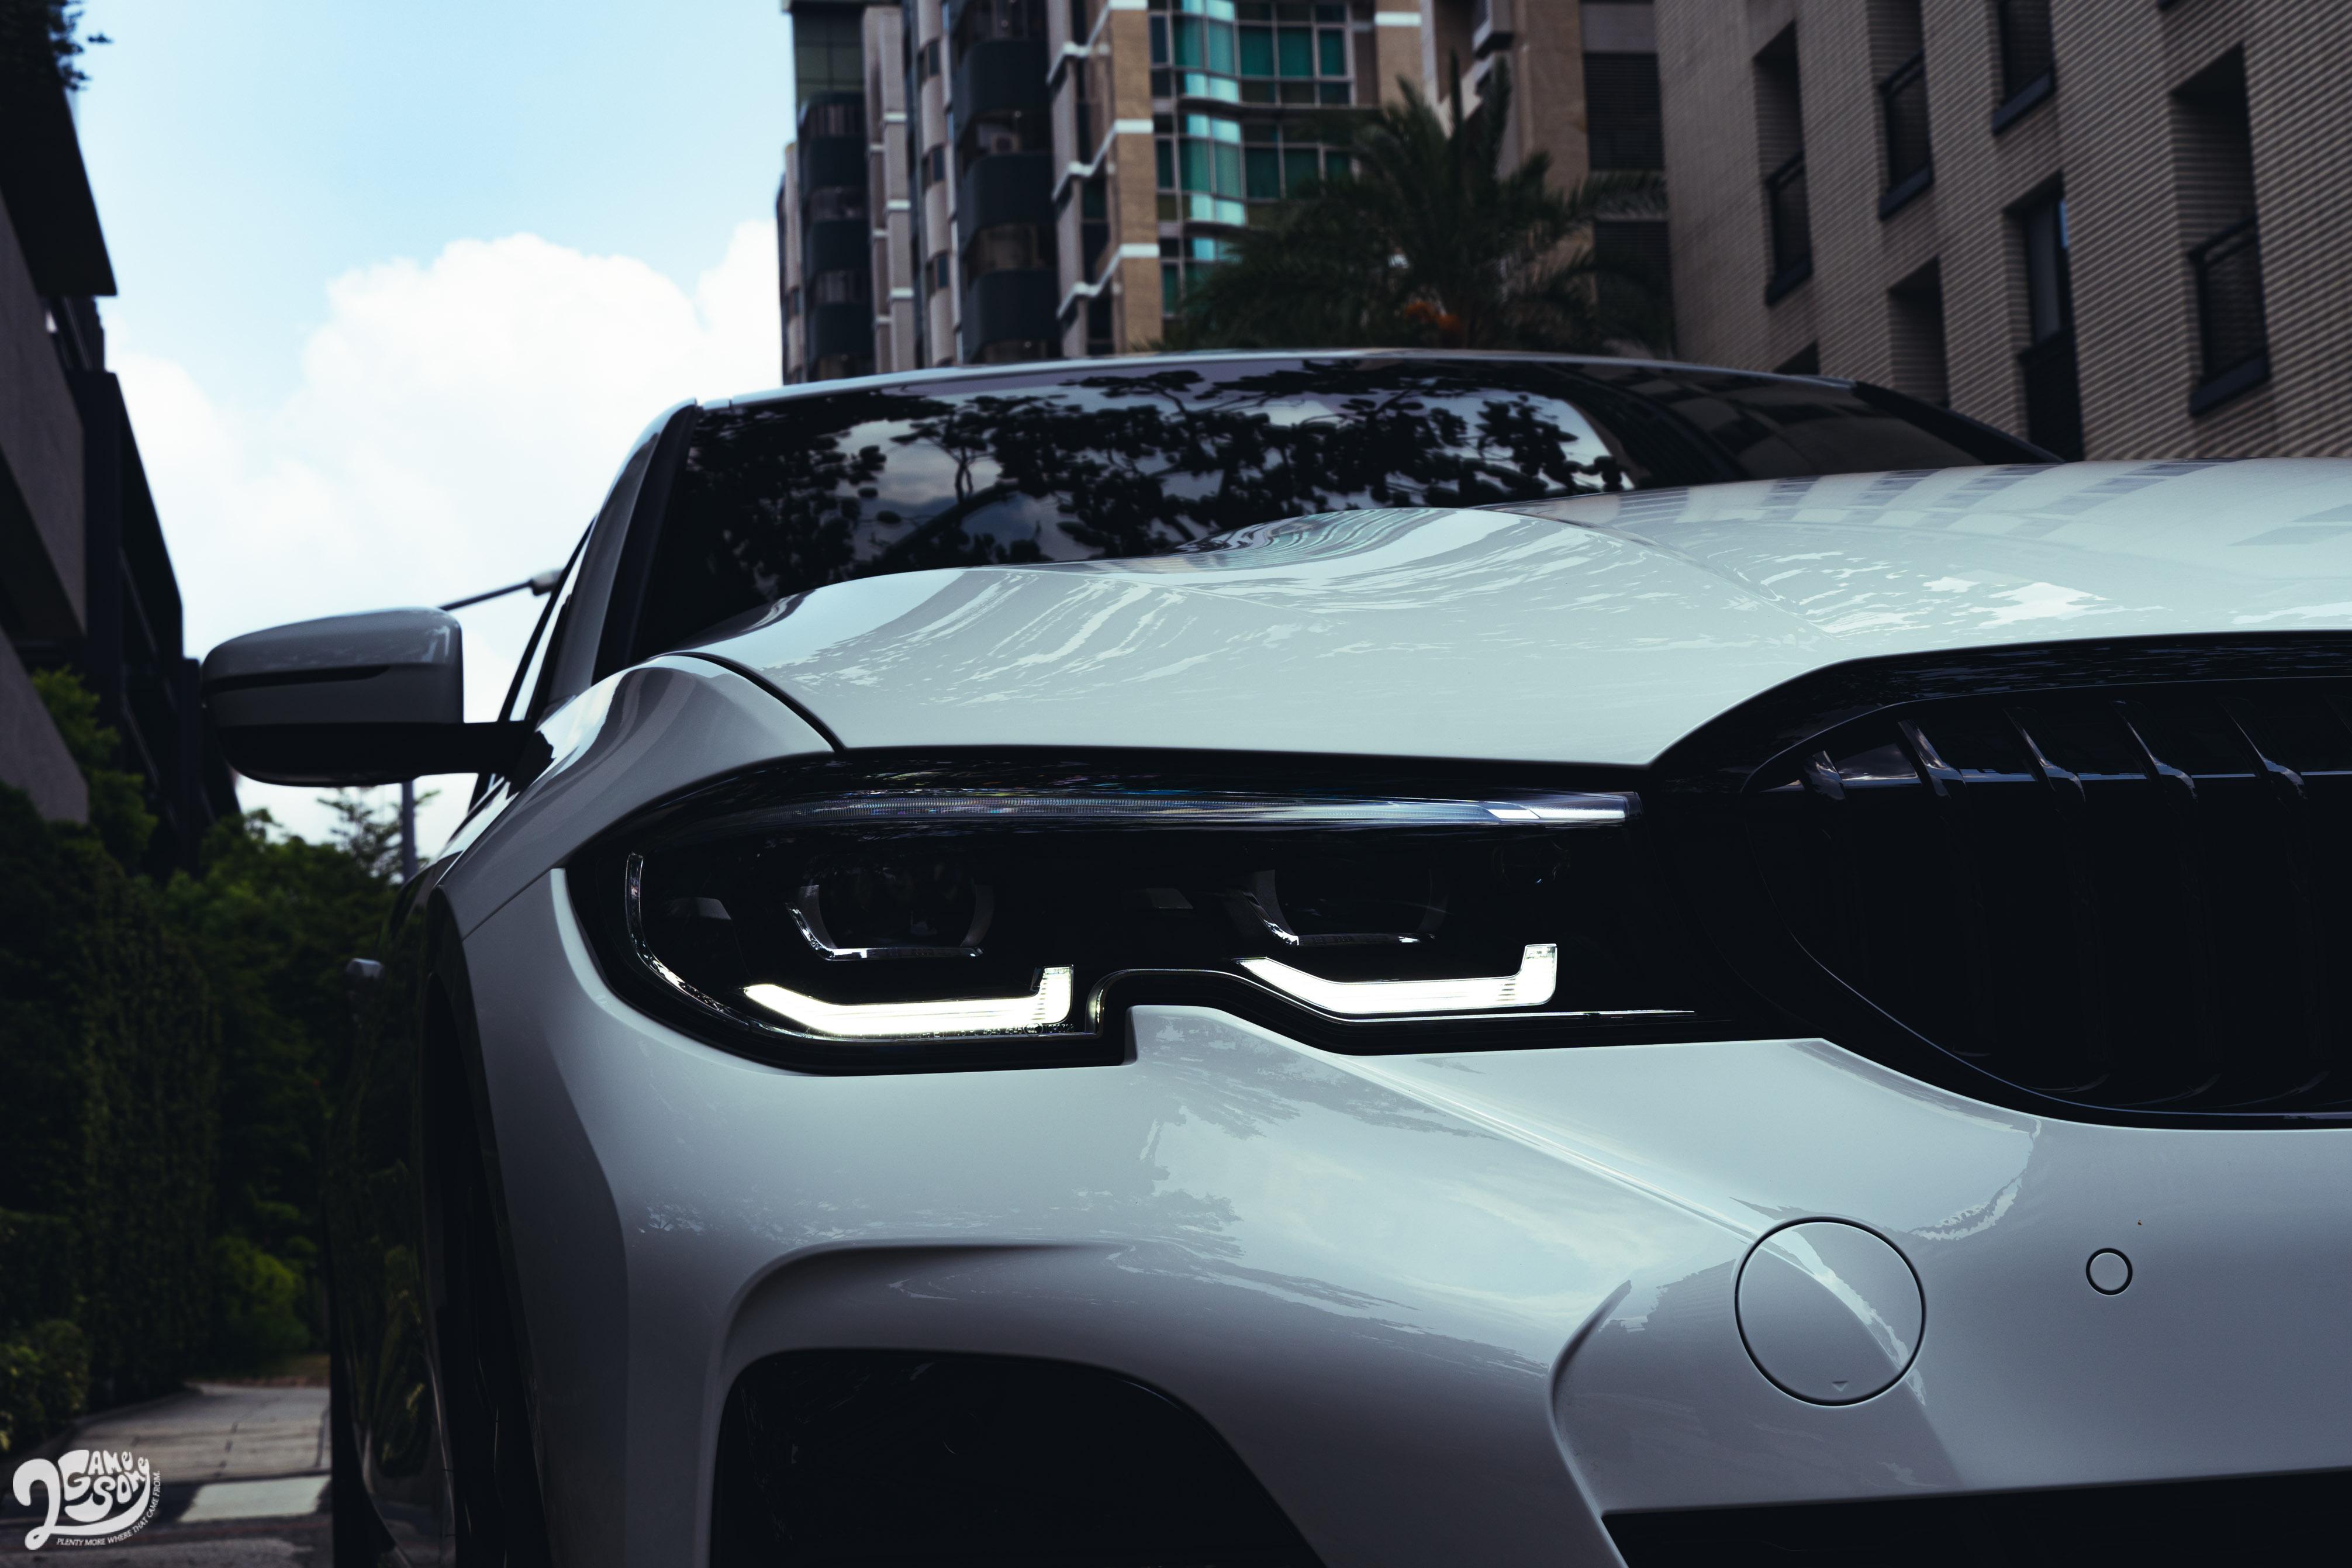 BMW 330i M Sport Midnight Edition夜型版售價 289 萬元,Touring 車型 296 萬元。